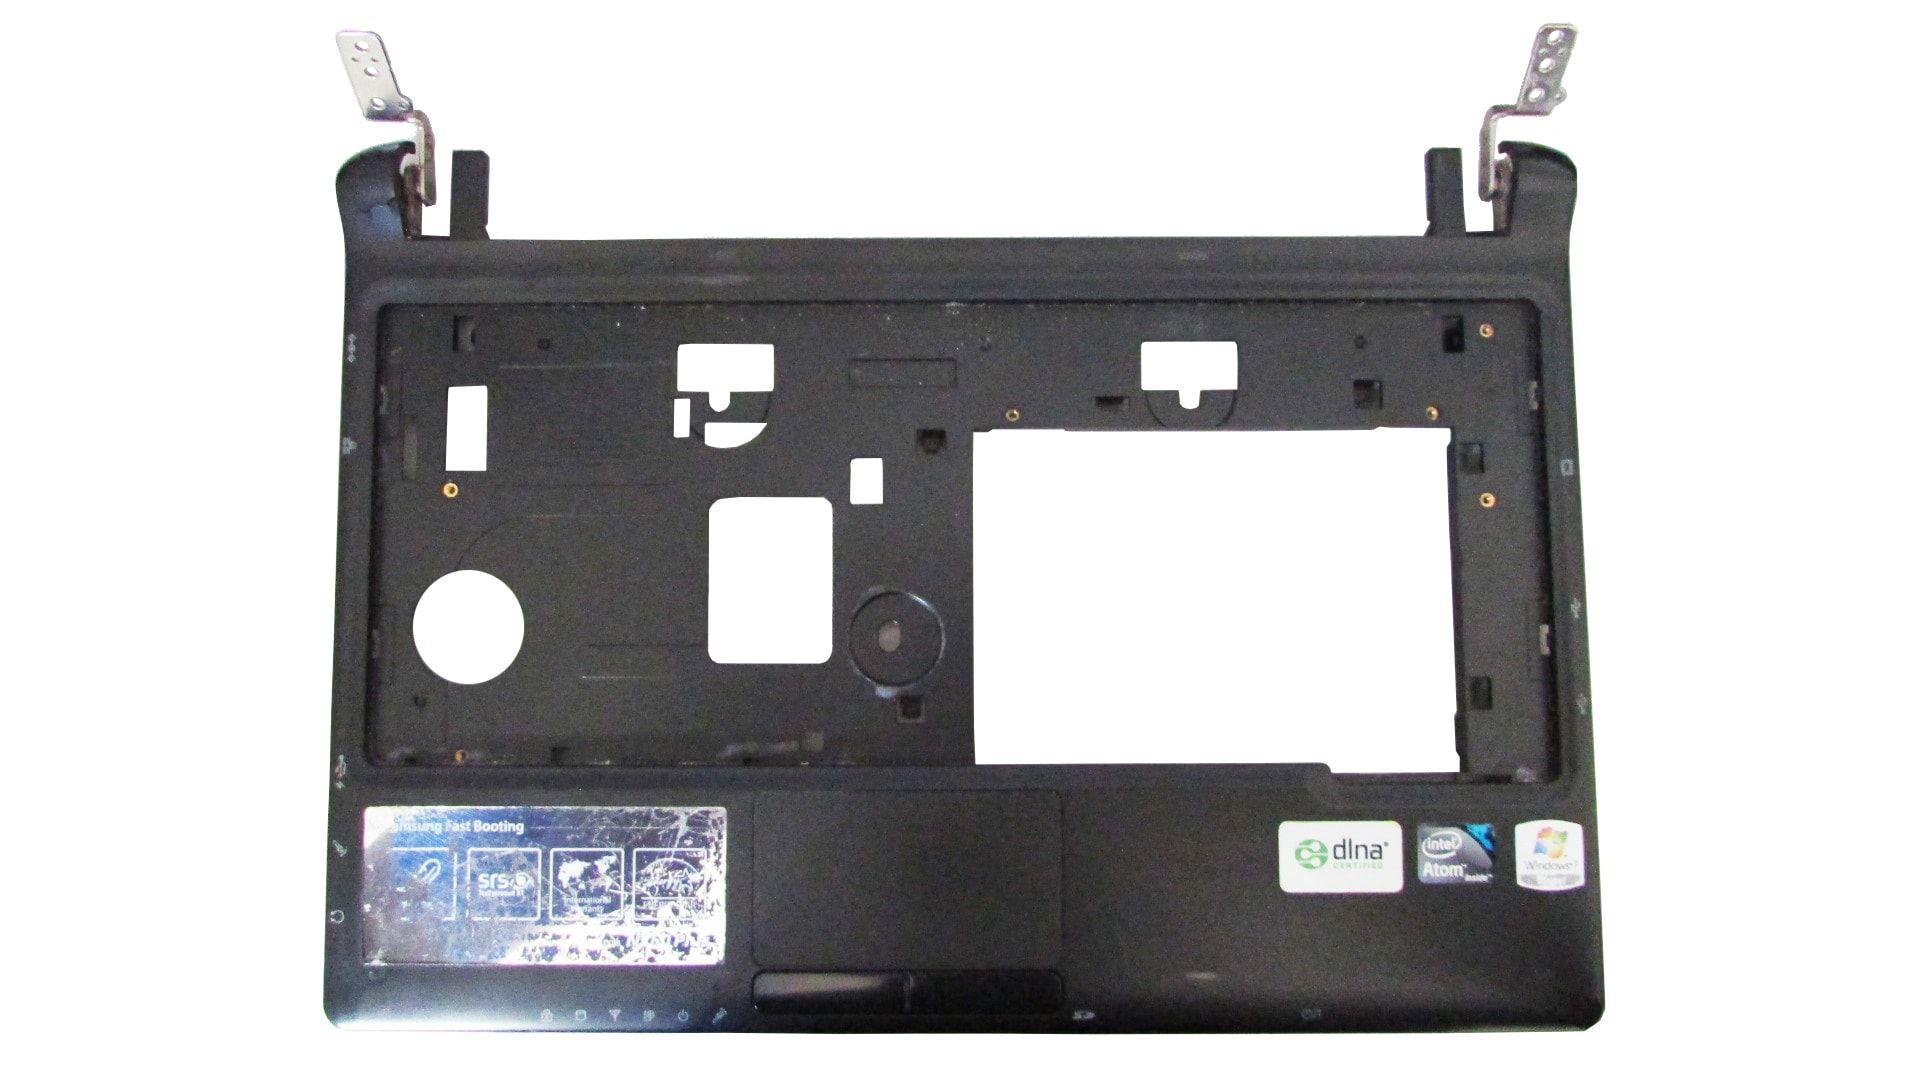 Carcaça Superior Touchpad Netbook Samsung N150 Plus BA75-02357 Semi Novo